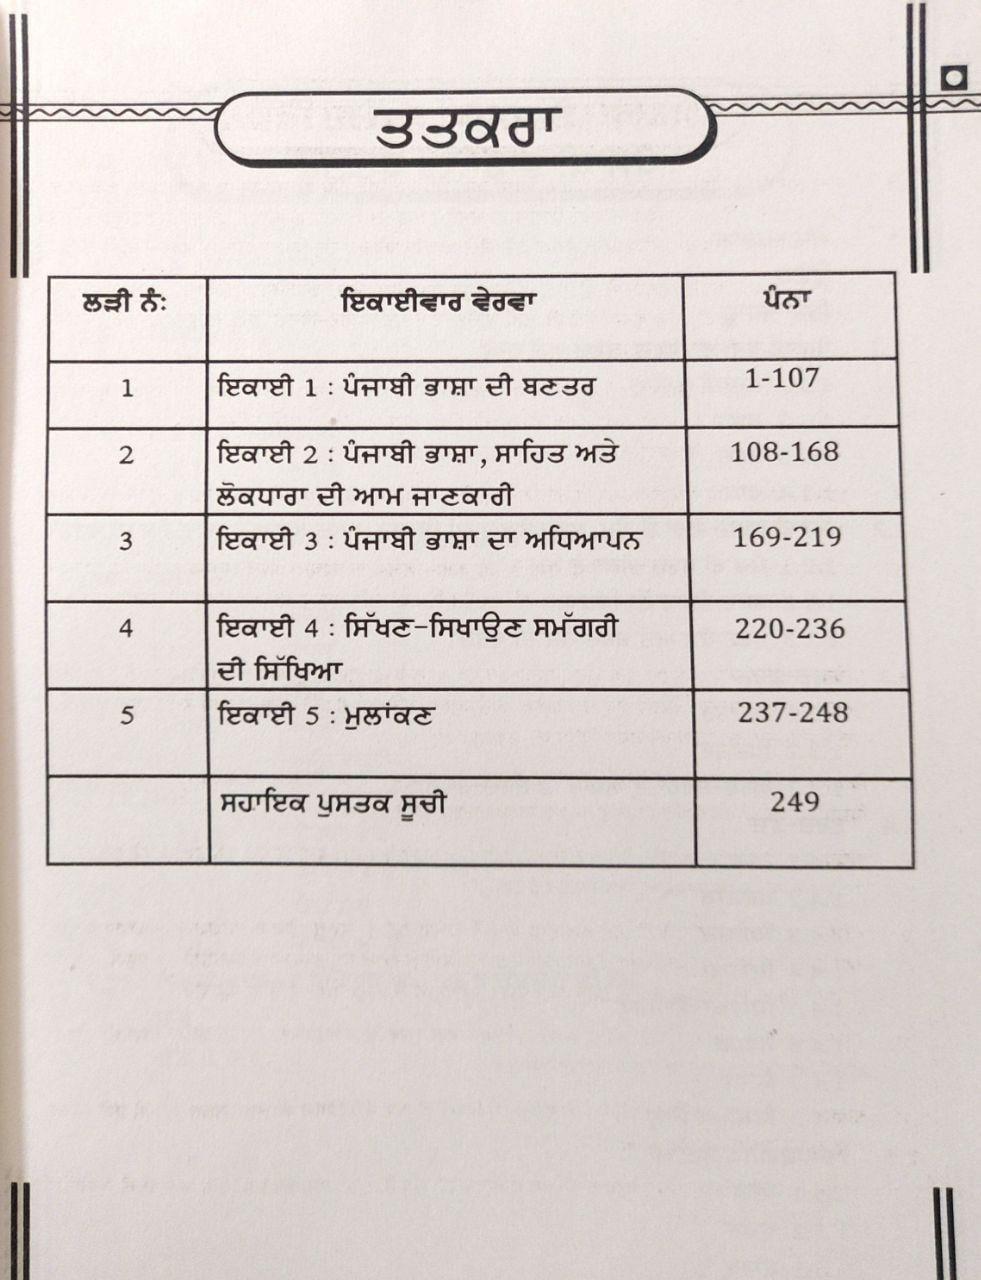 RBSE Punjabi Vyakaran Ate Likhat Rachna BSTC DELED (With Bainding)